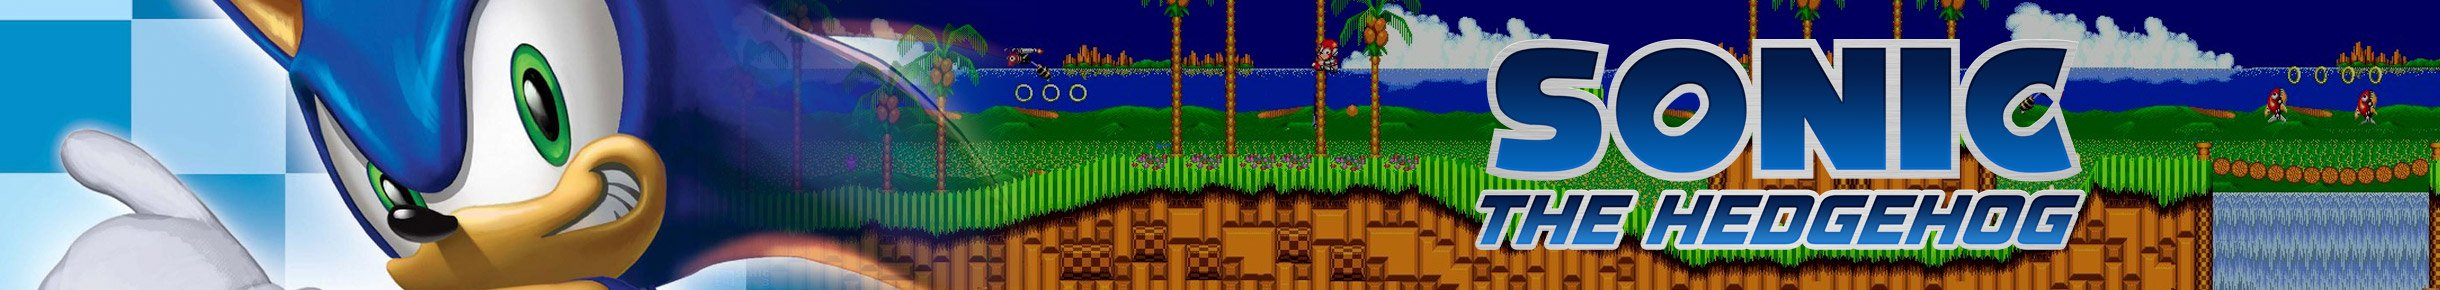 Sonic Merchandise Banner